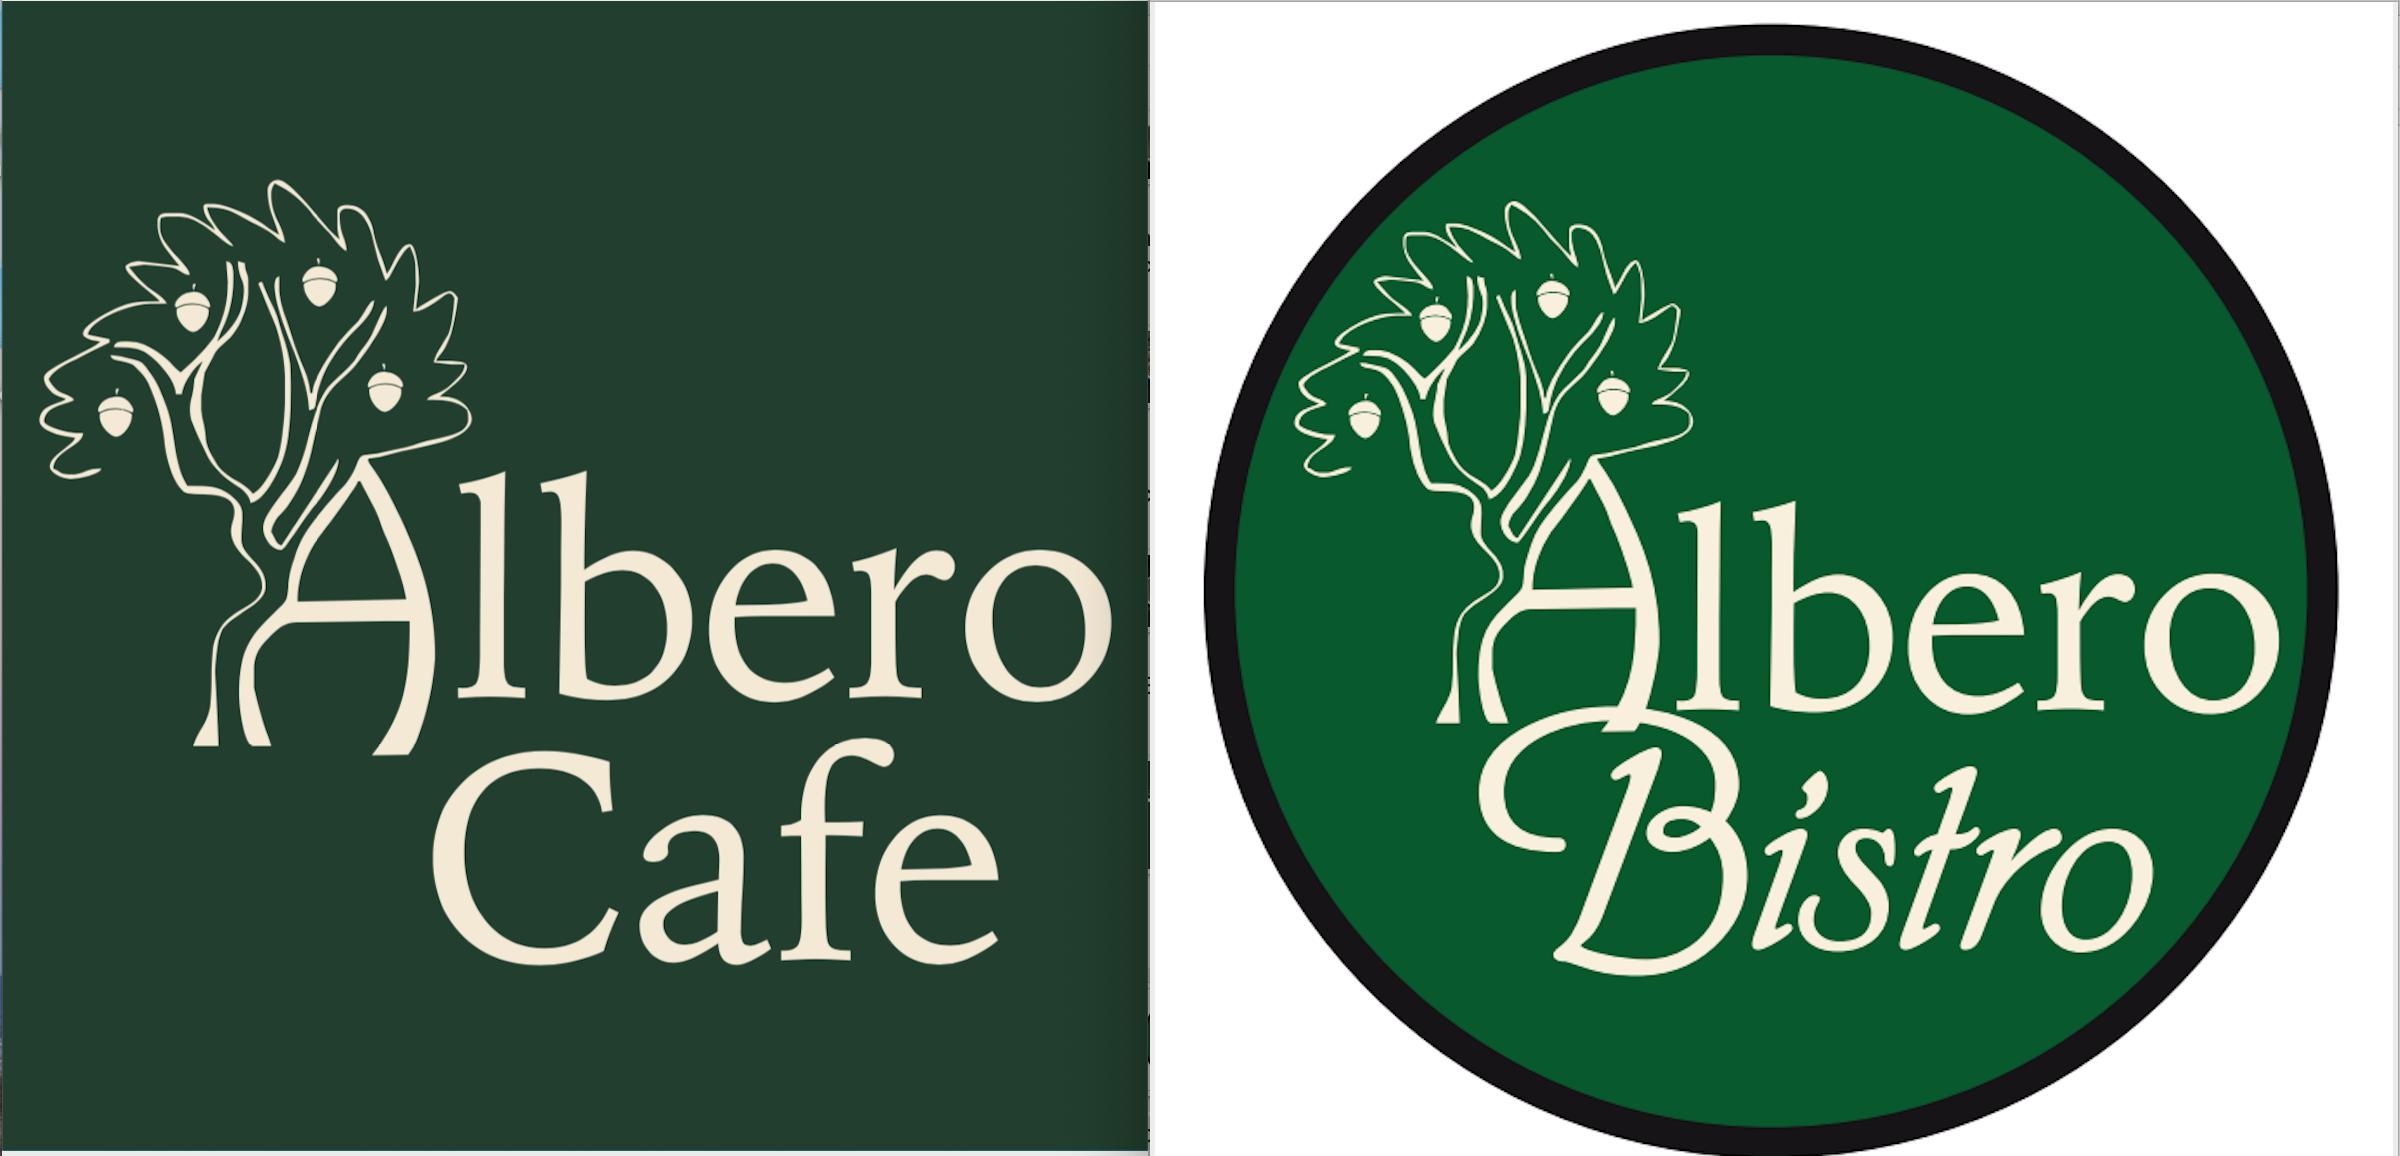 Albero Cafe & Albero Bistro